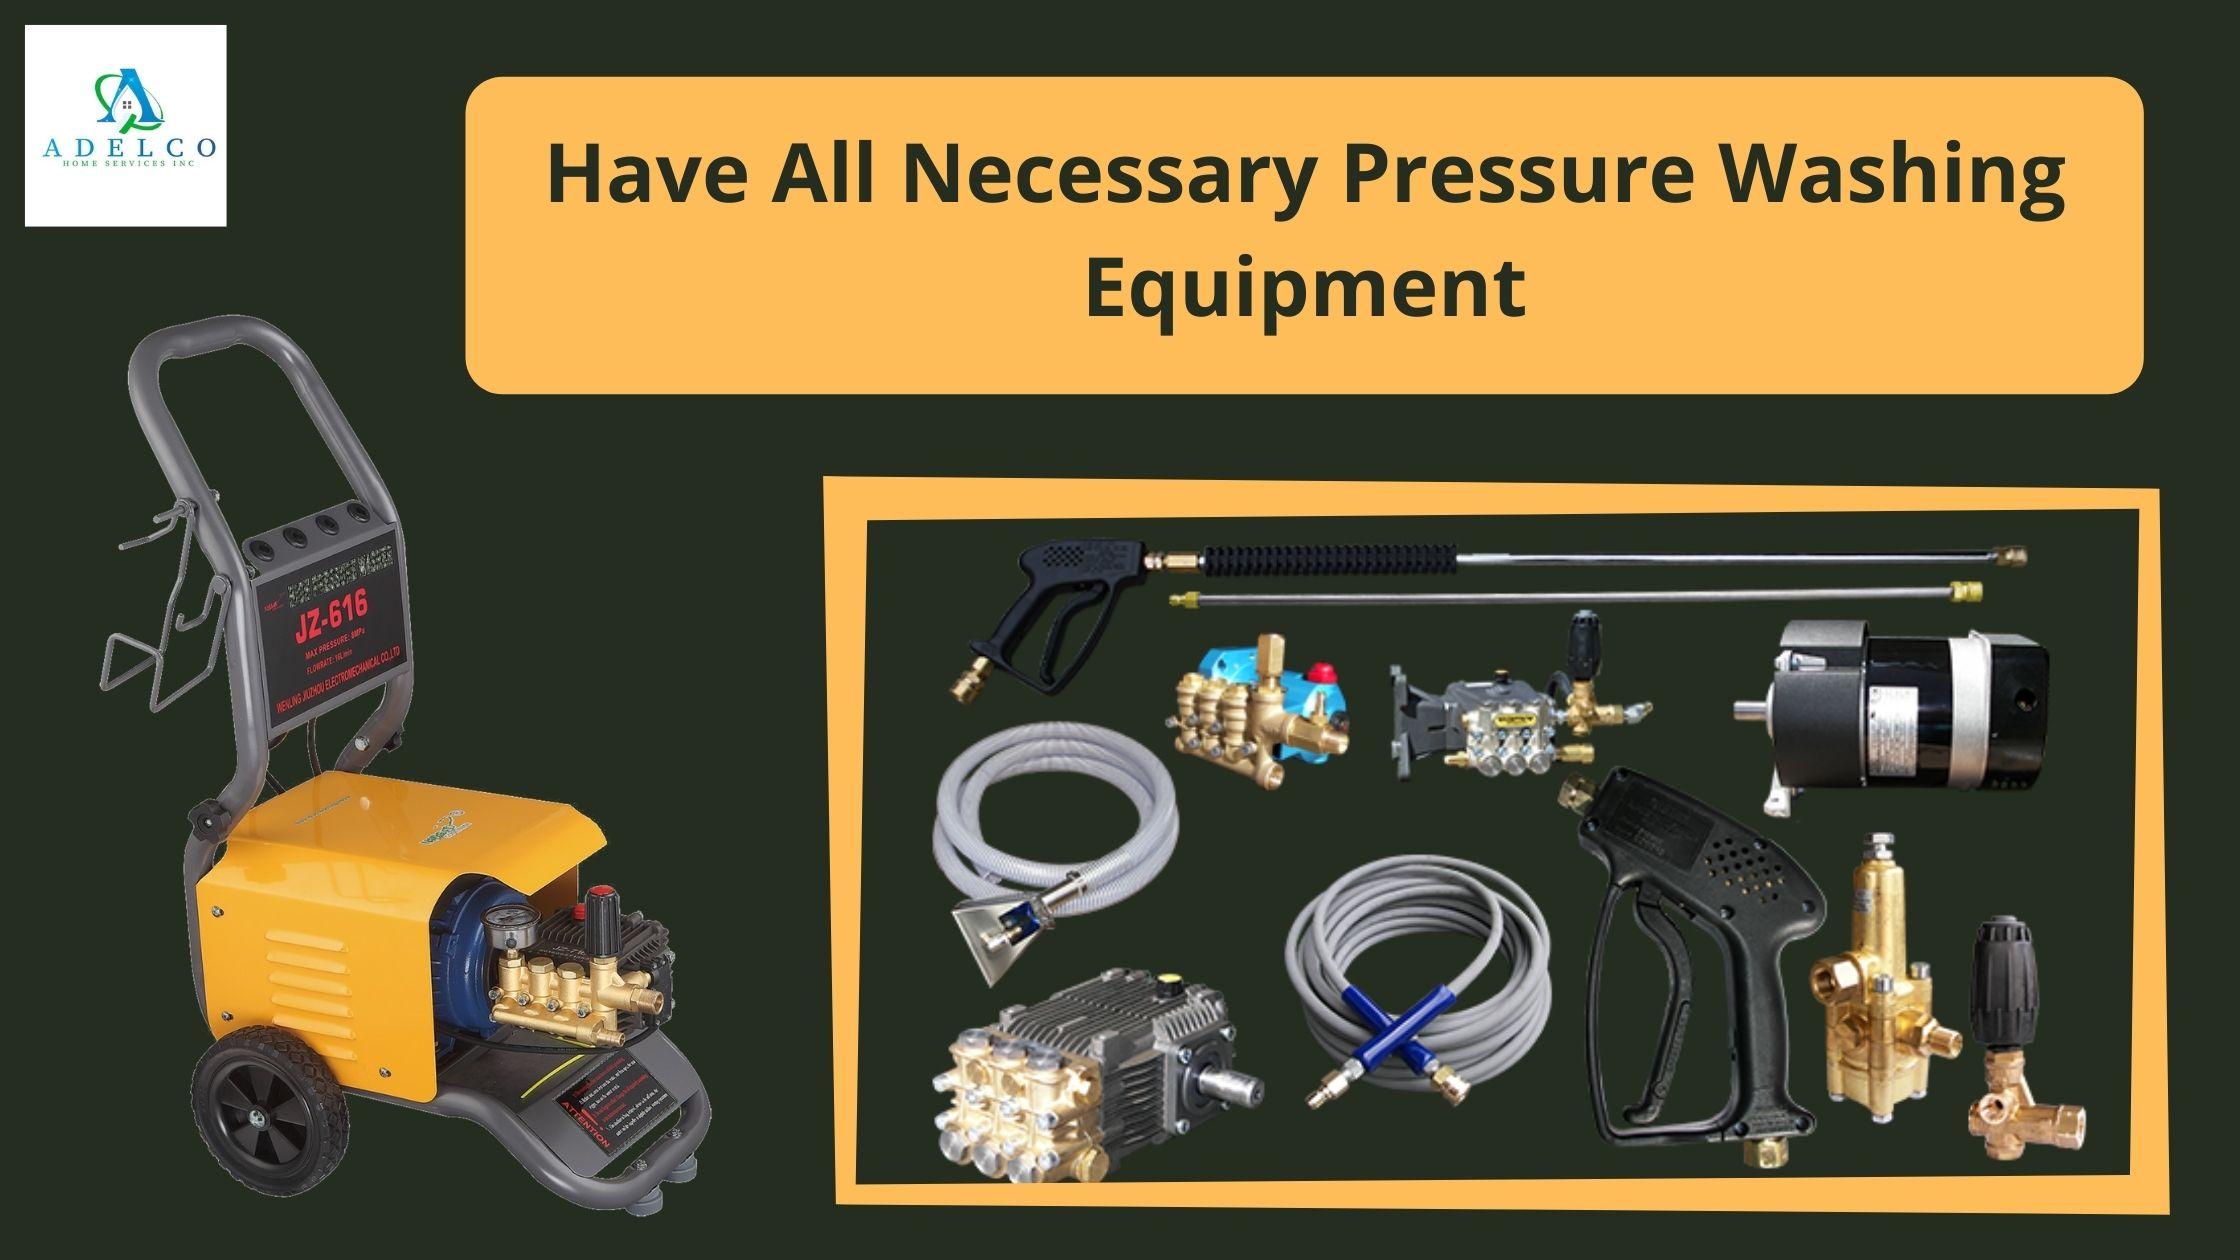 Pressure Washer Has All Necessary Pressure Washing Equipment